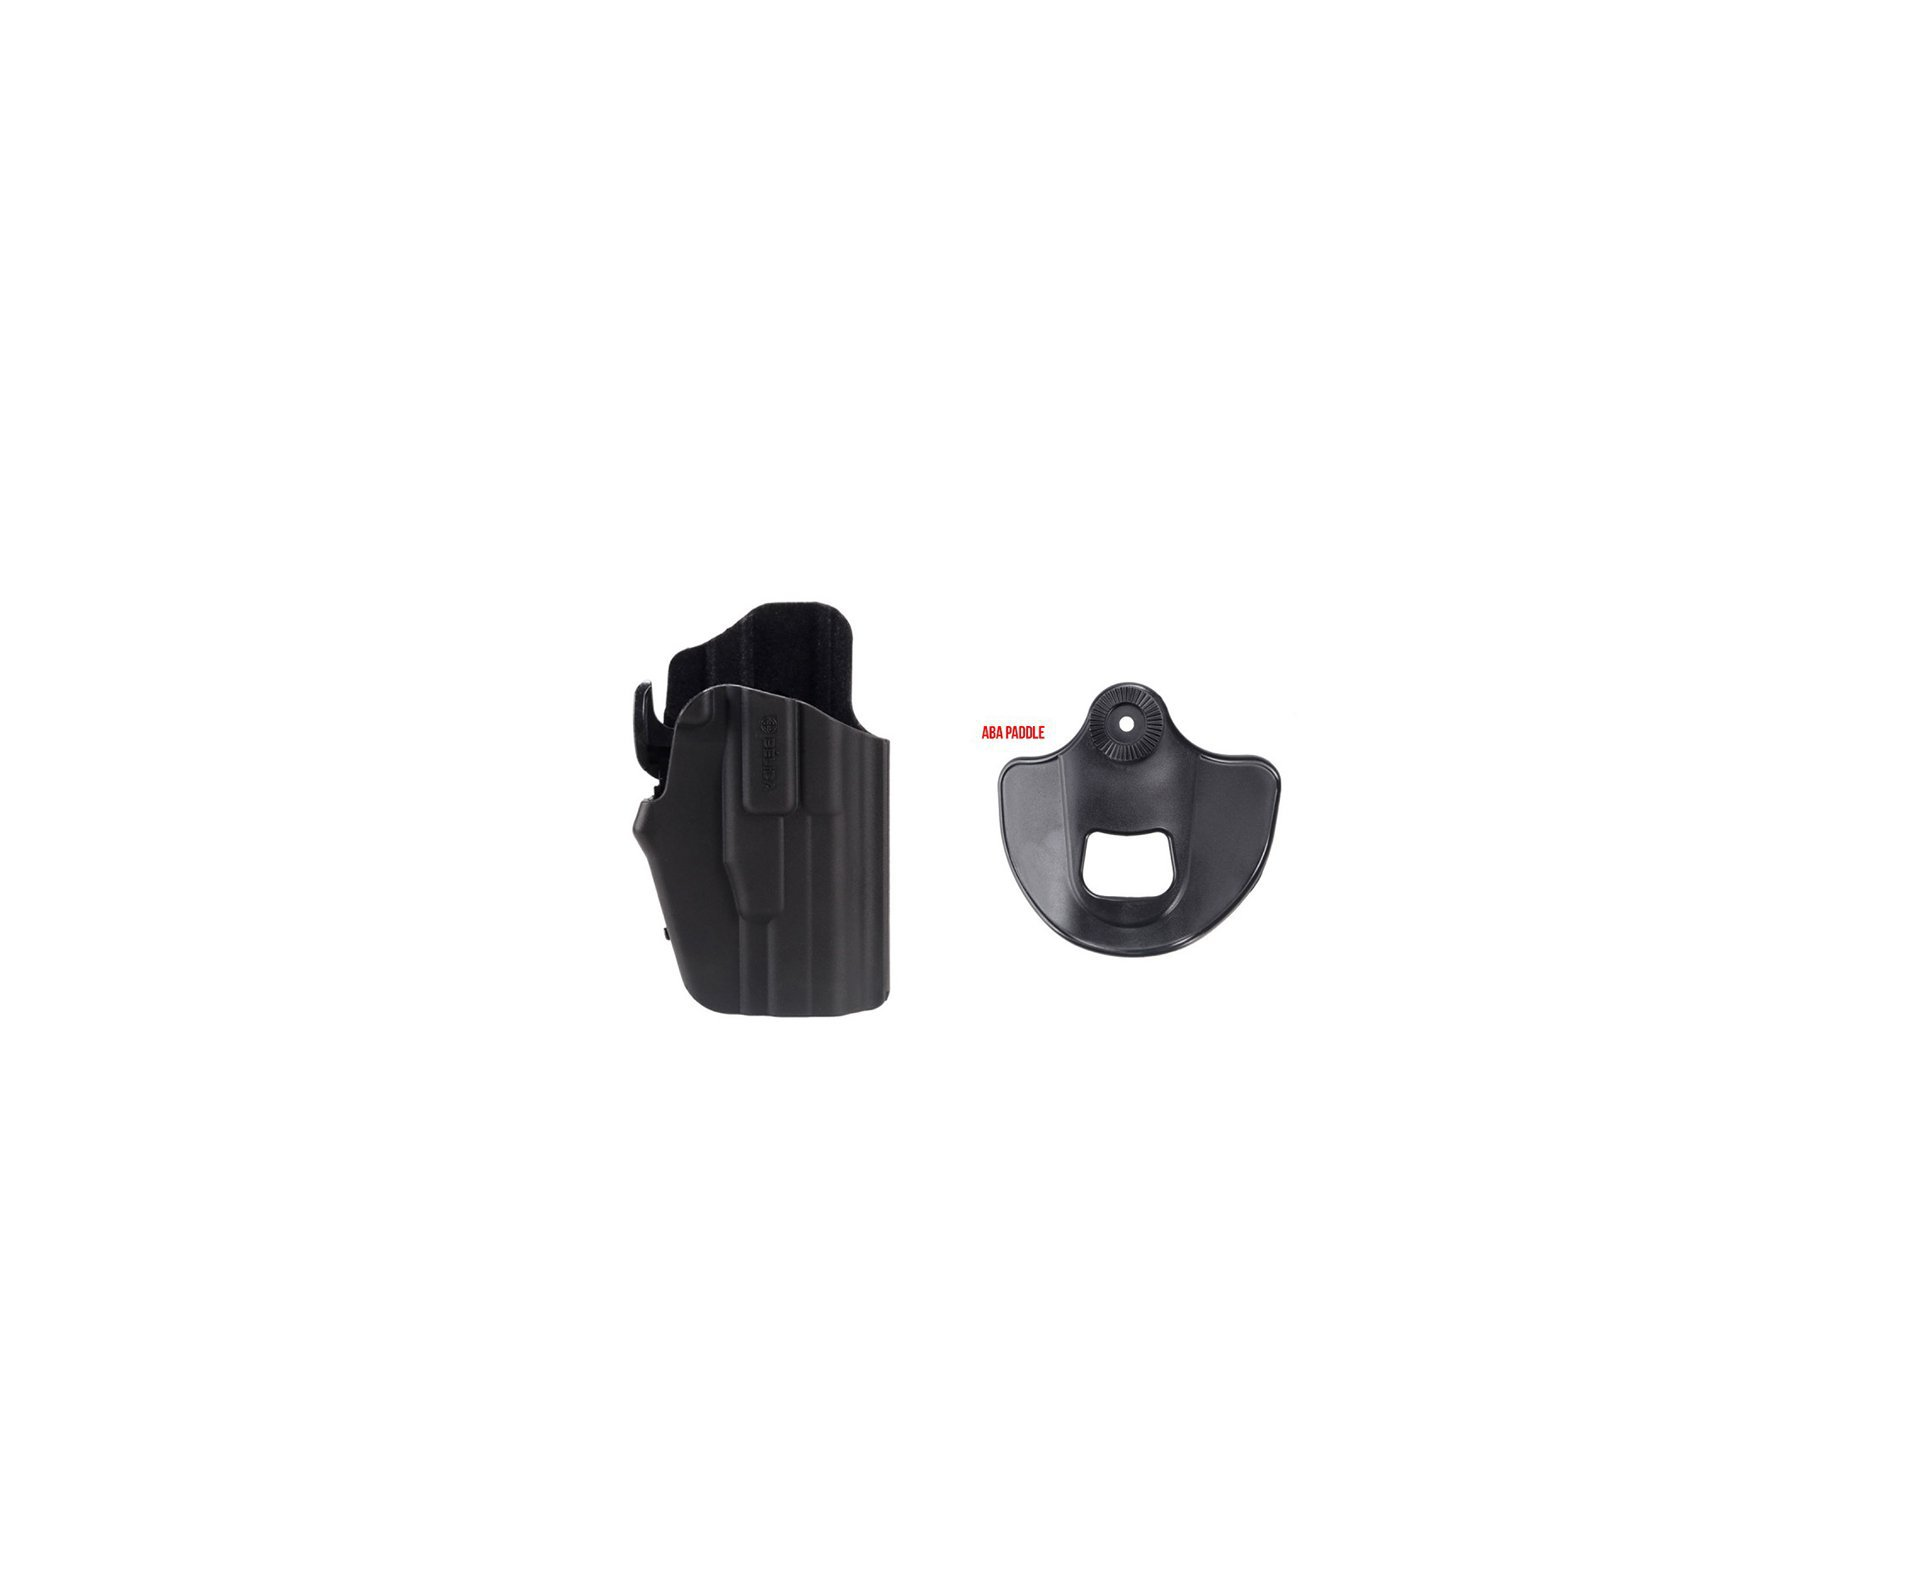 Coldre Evolution I Pistola Taurus, Glock, Whalter, H&k, S&w  Com Adaptador Paddle Canhoto - Belica